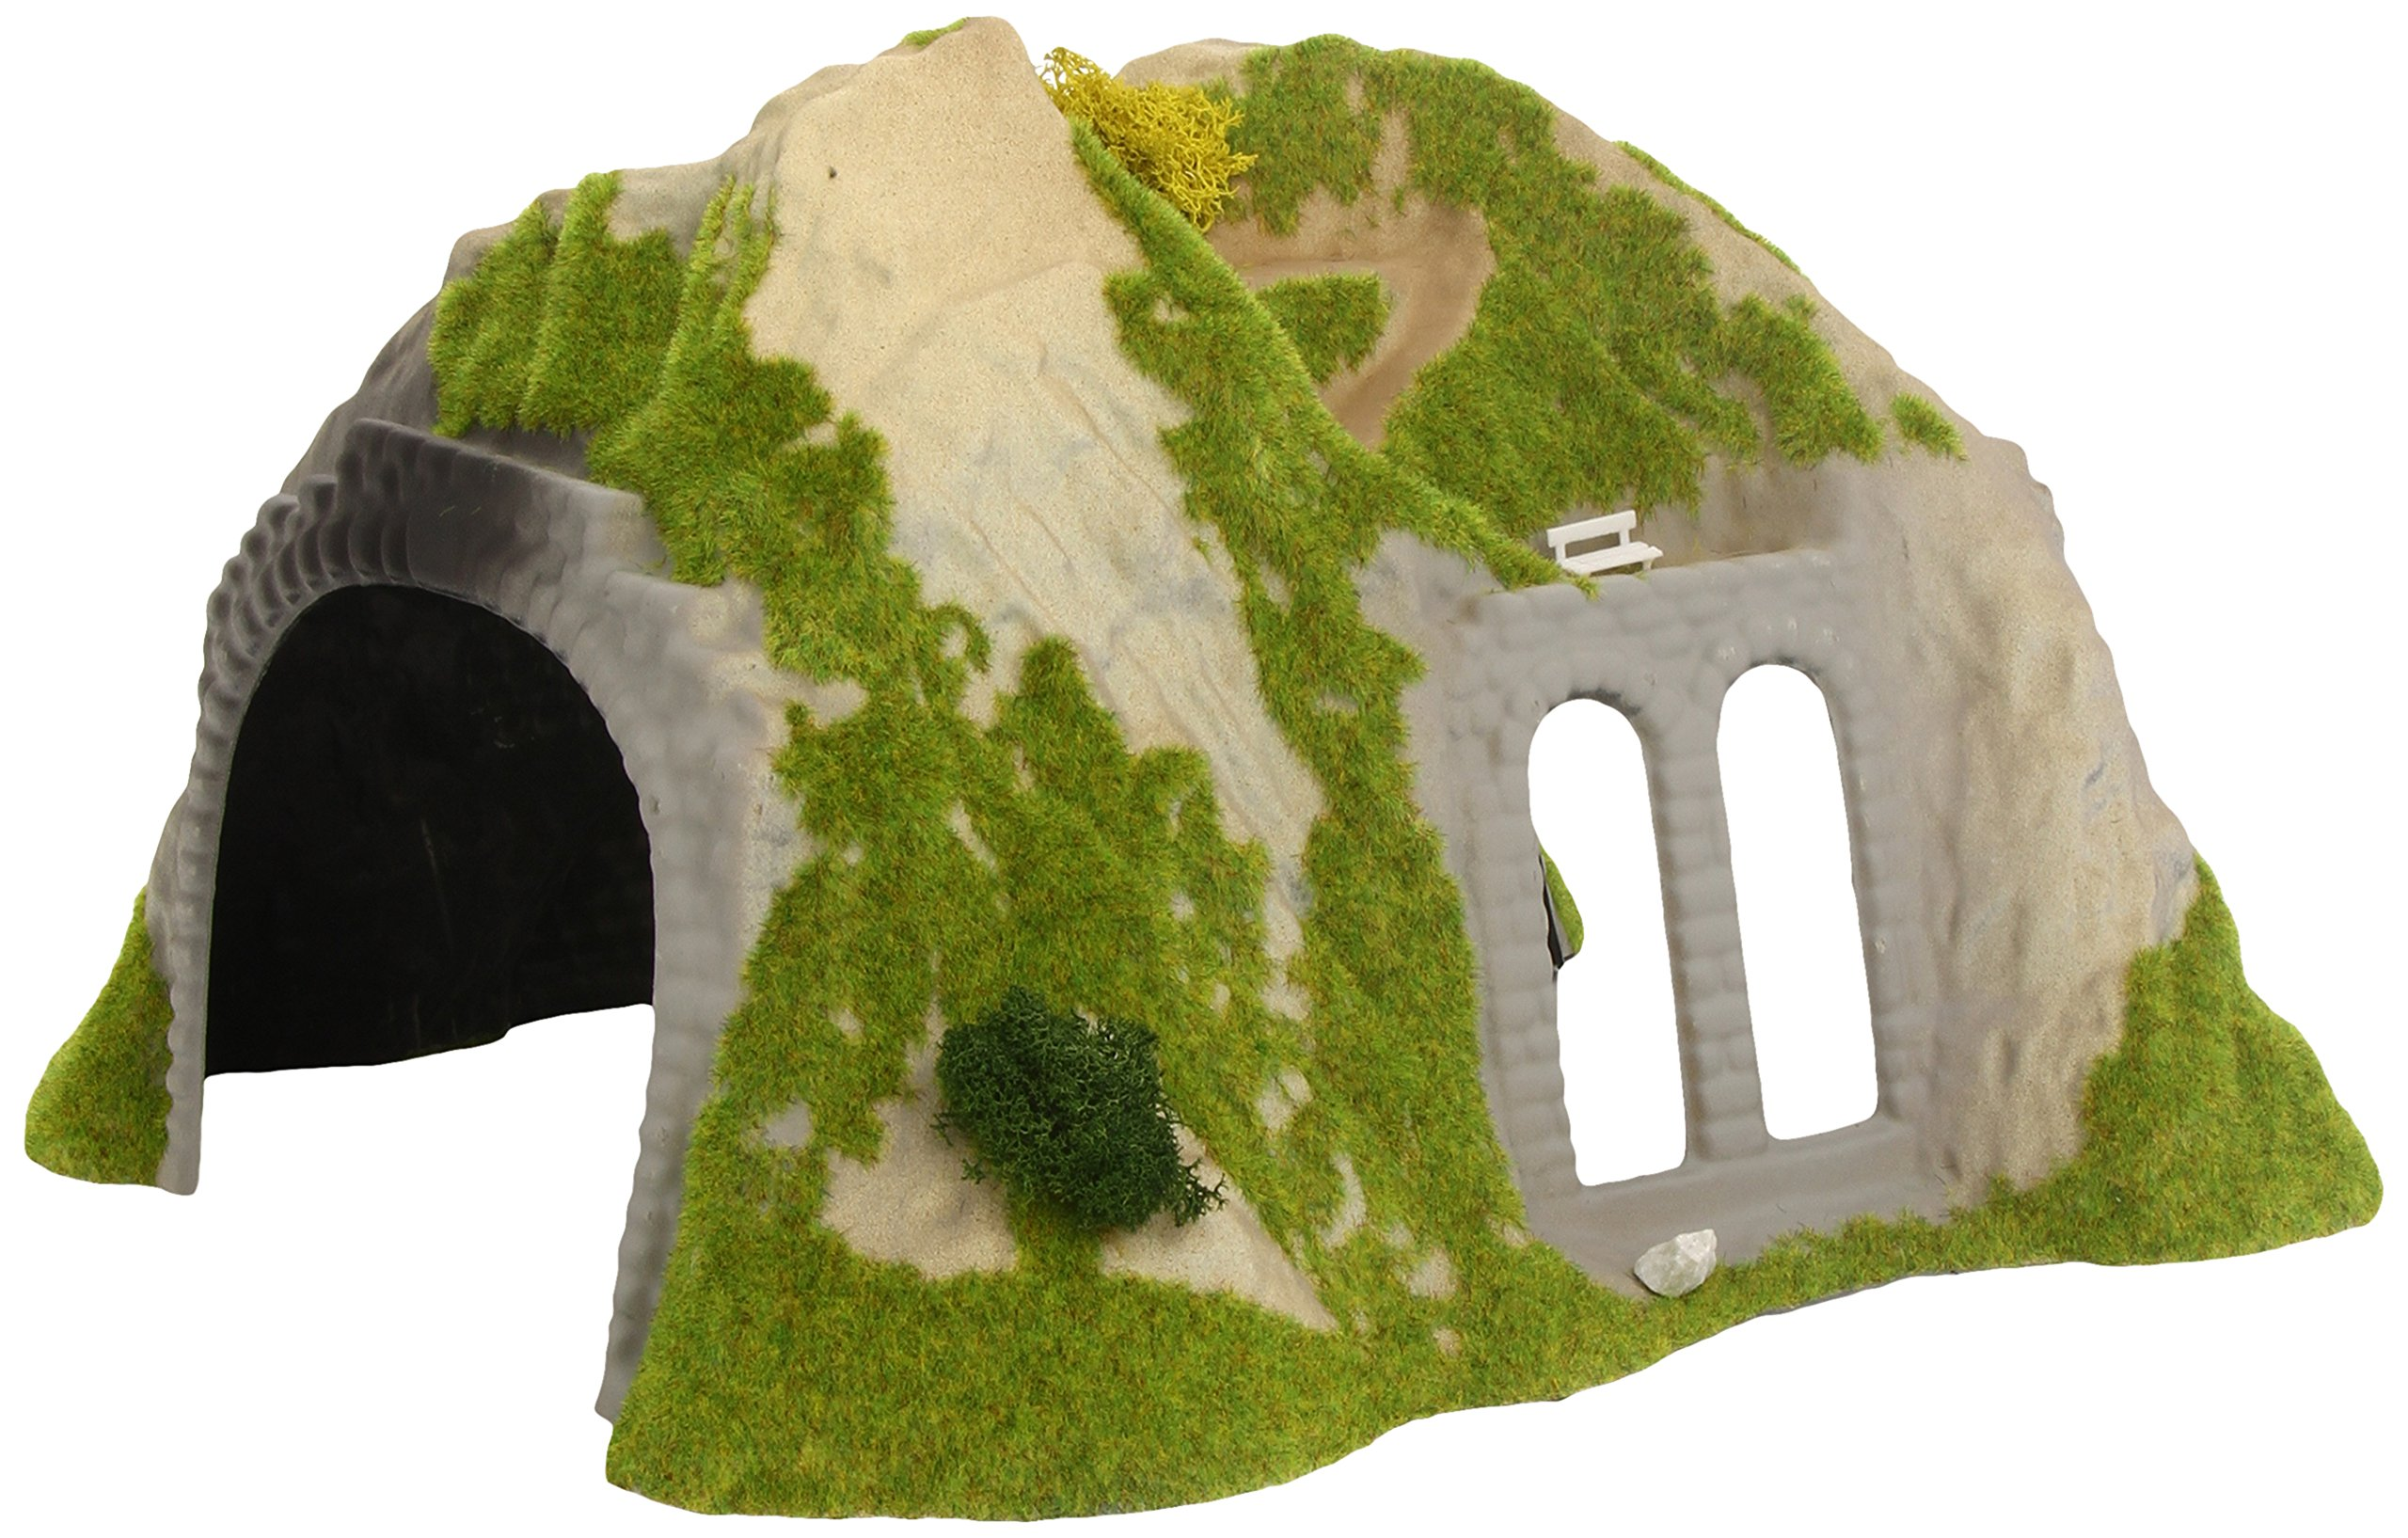 Noch 02430 30 x 28 cm Straight Tunnel Double Track Landscape Modelling